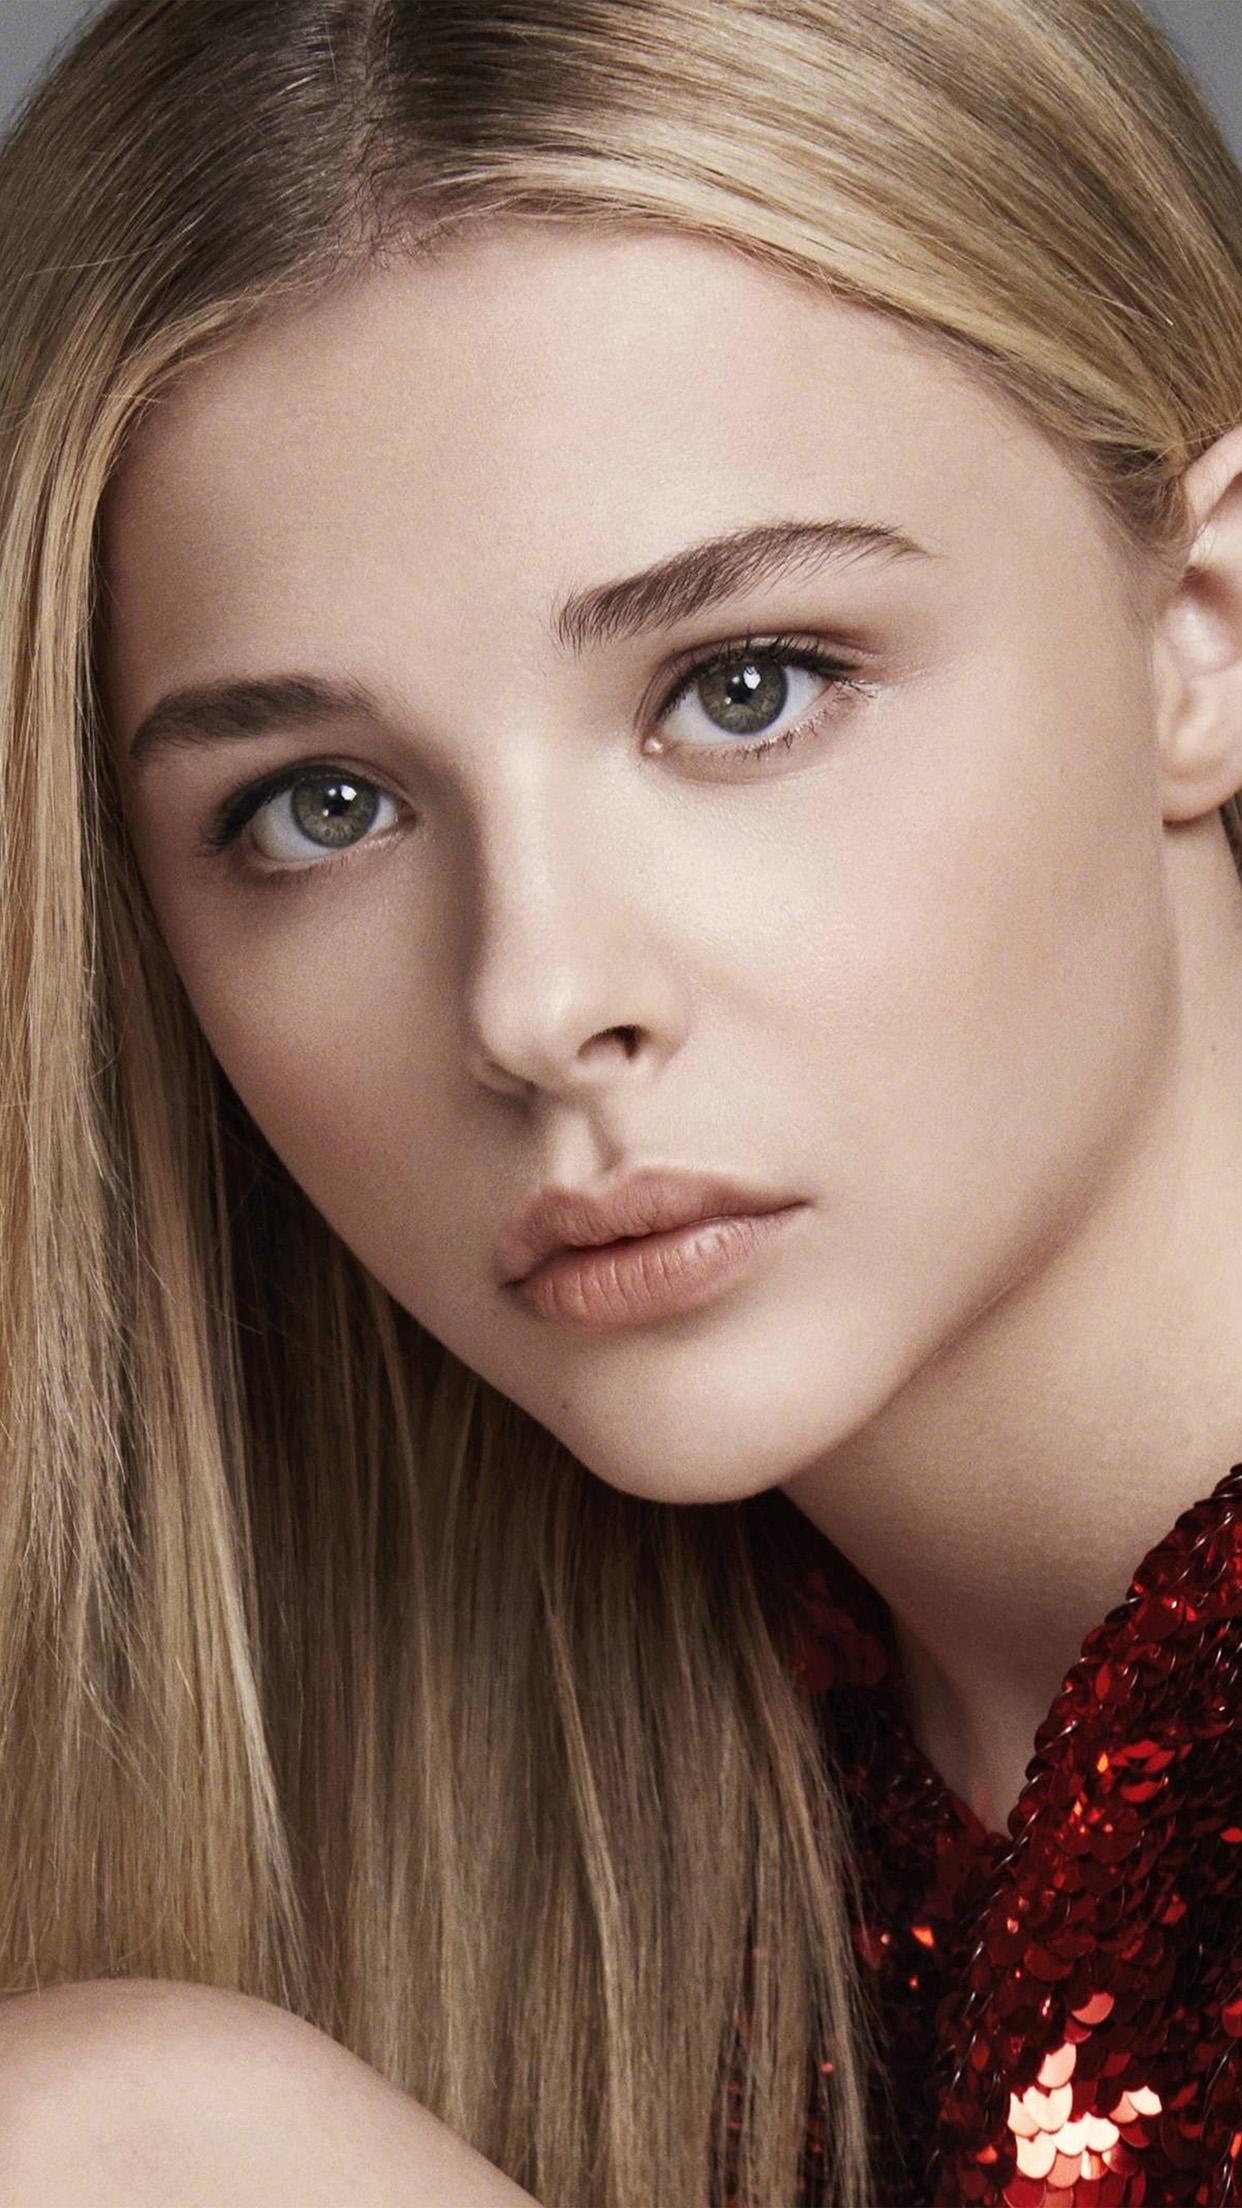 Chloe (actress)